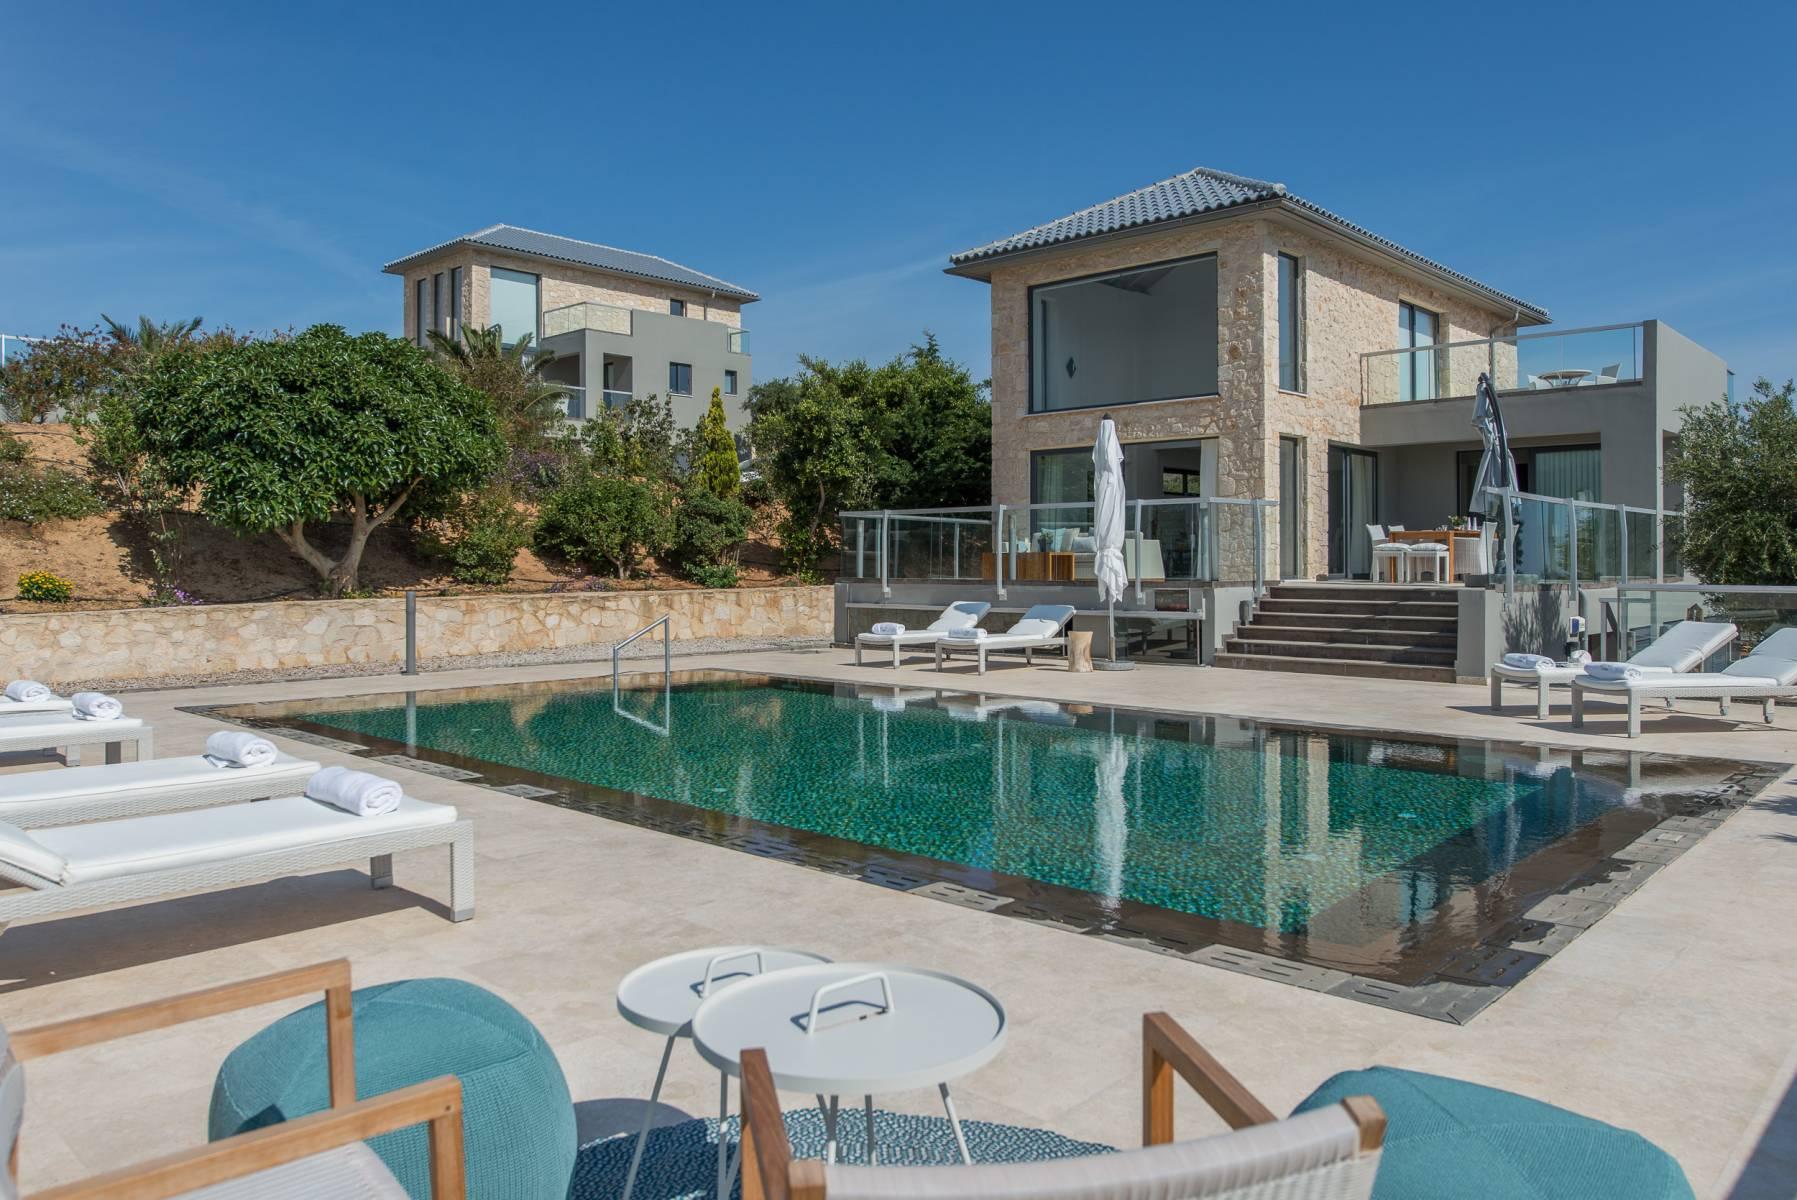 Luxury villas in Tersanas